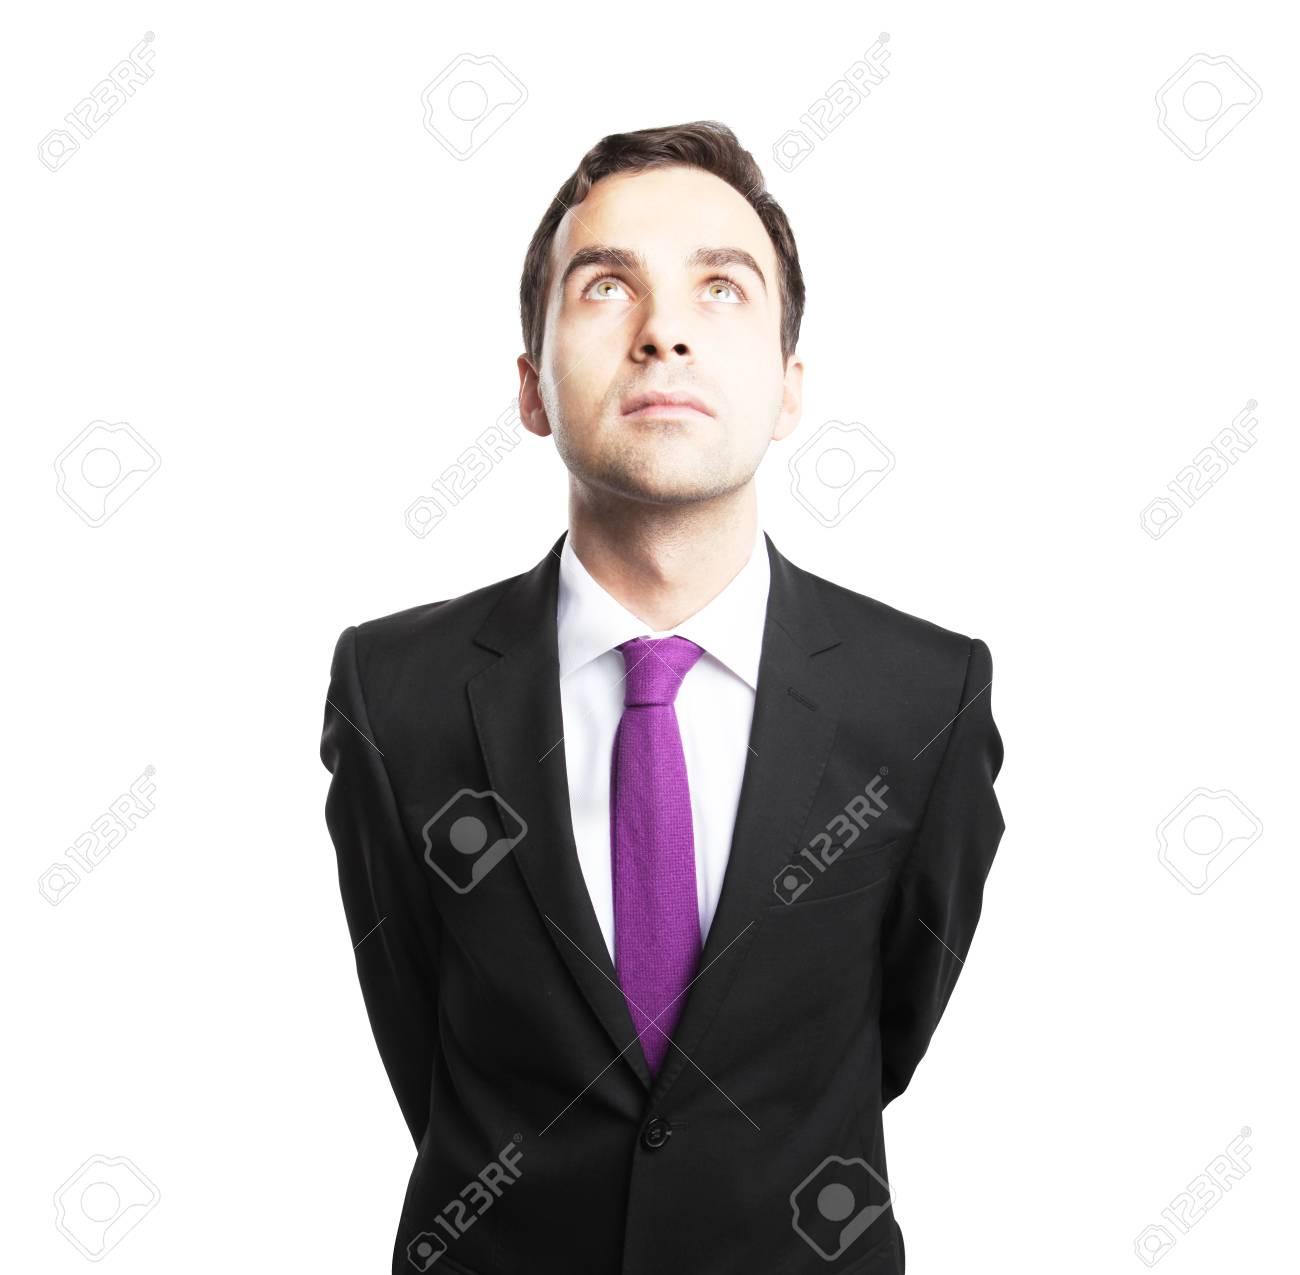 businessman on a white background Stock Photo - 16763784